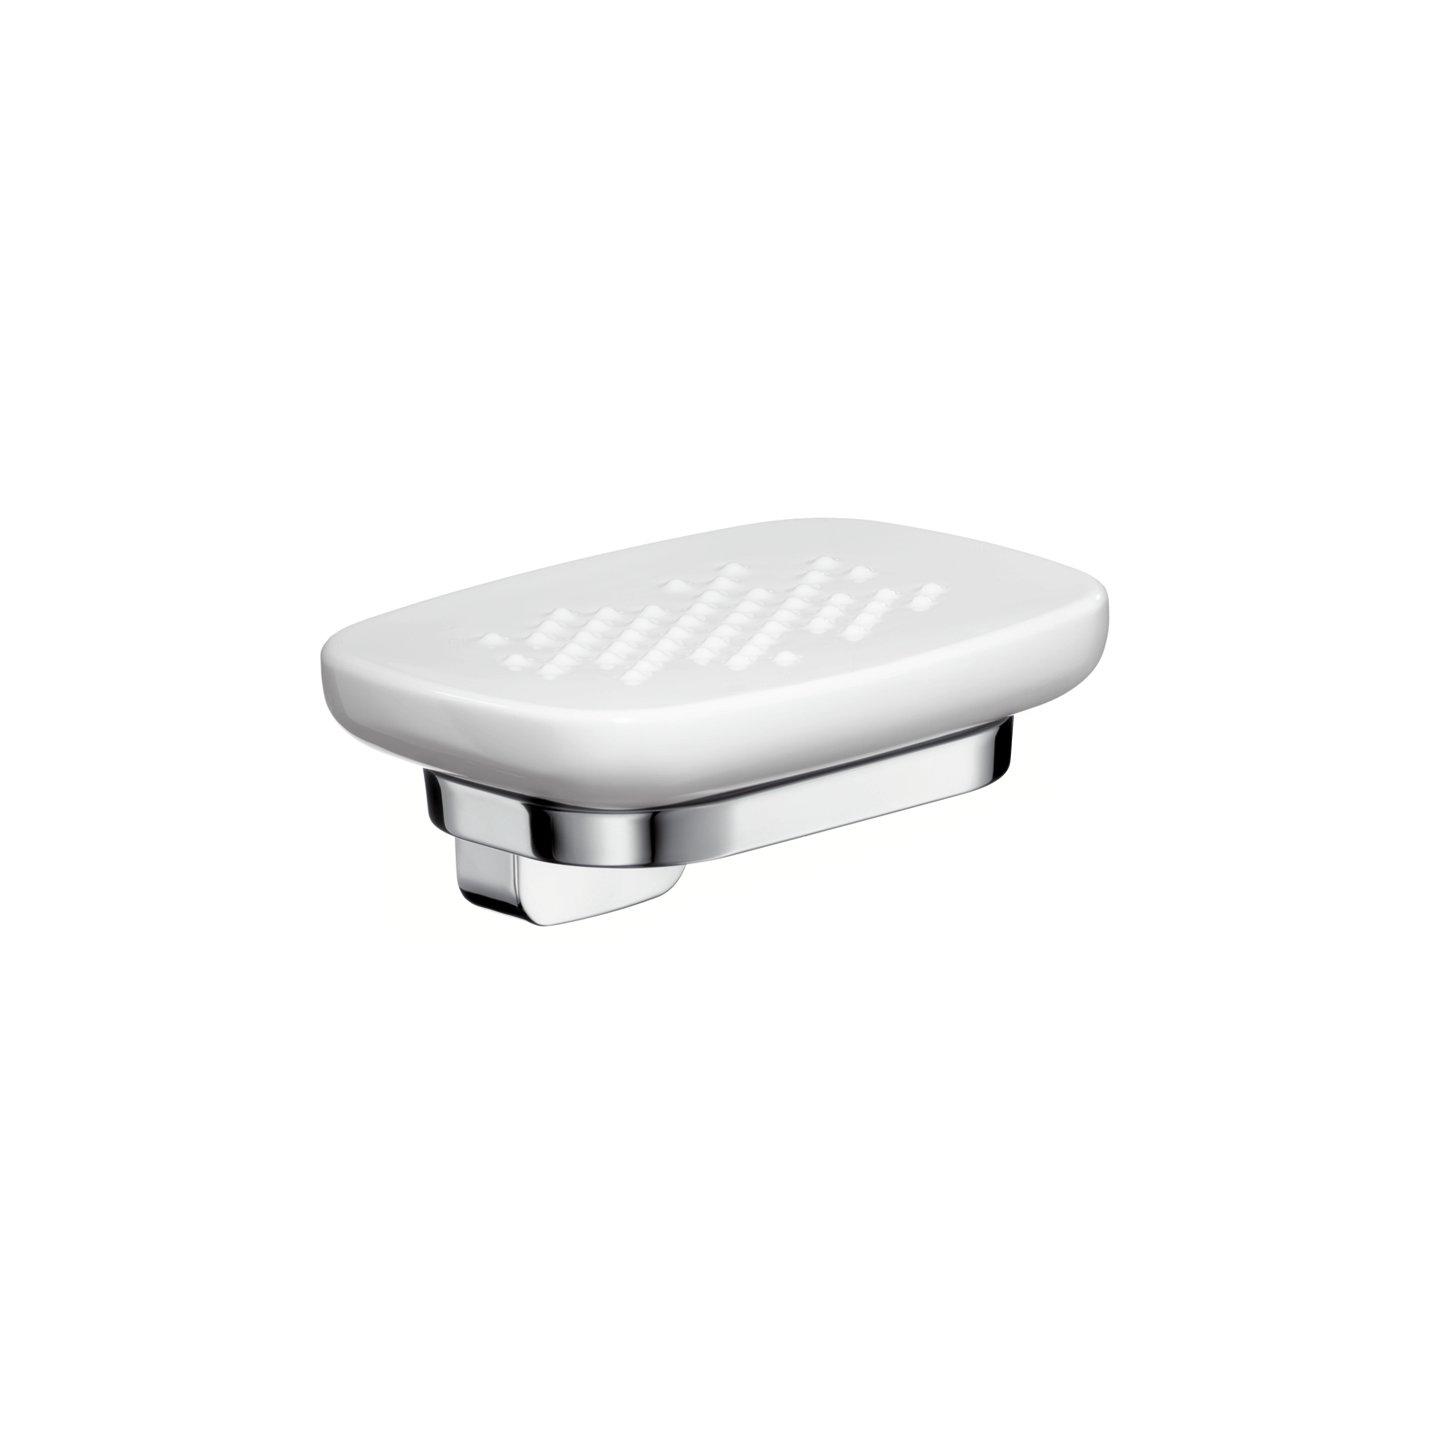 Axor 42433000 Urquiola Soap Dish, Chrome